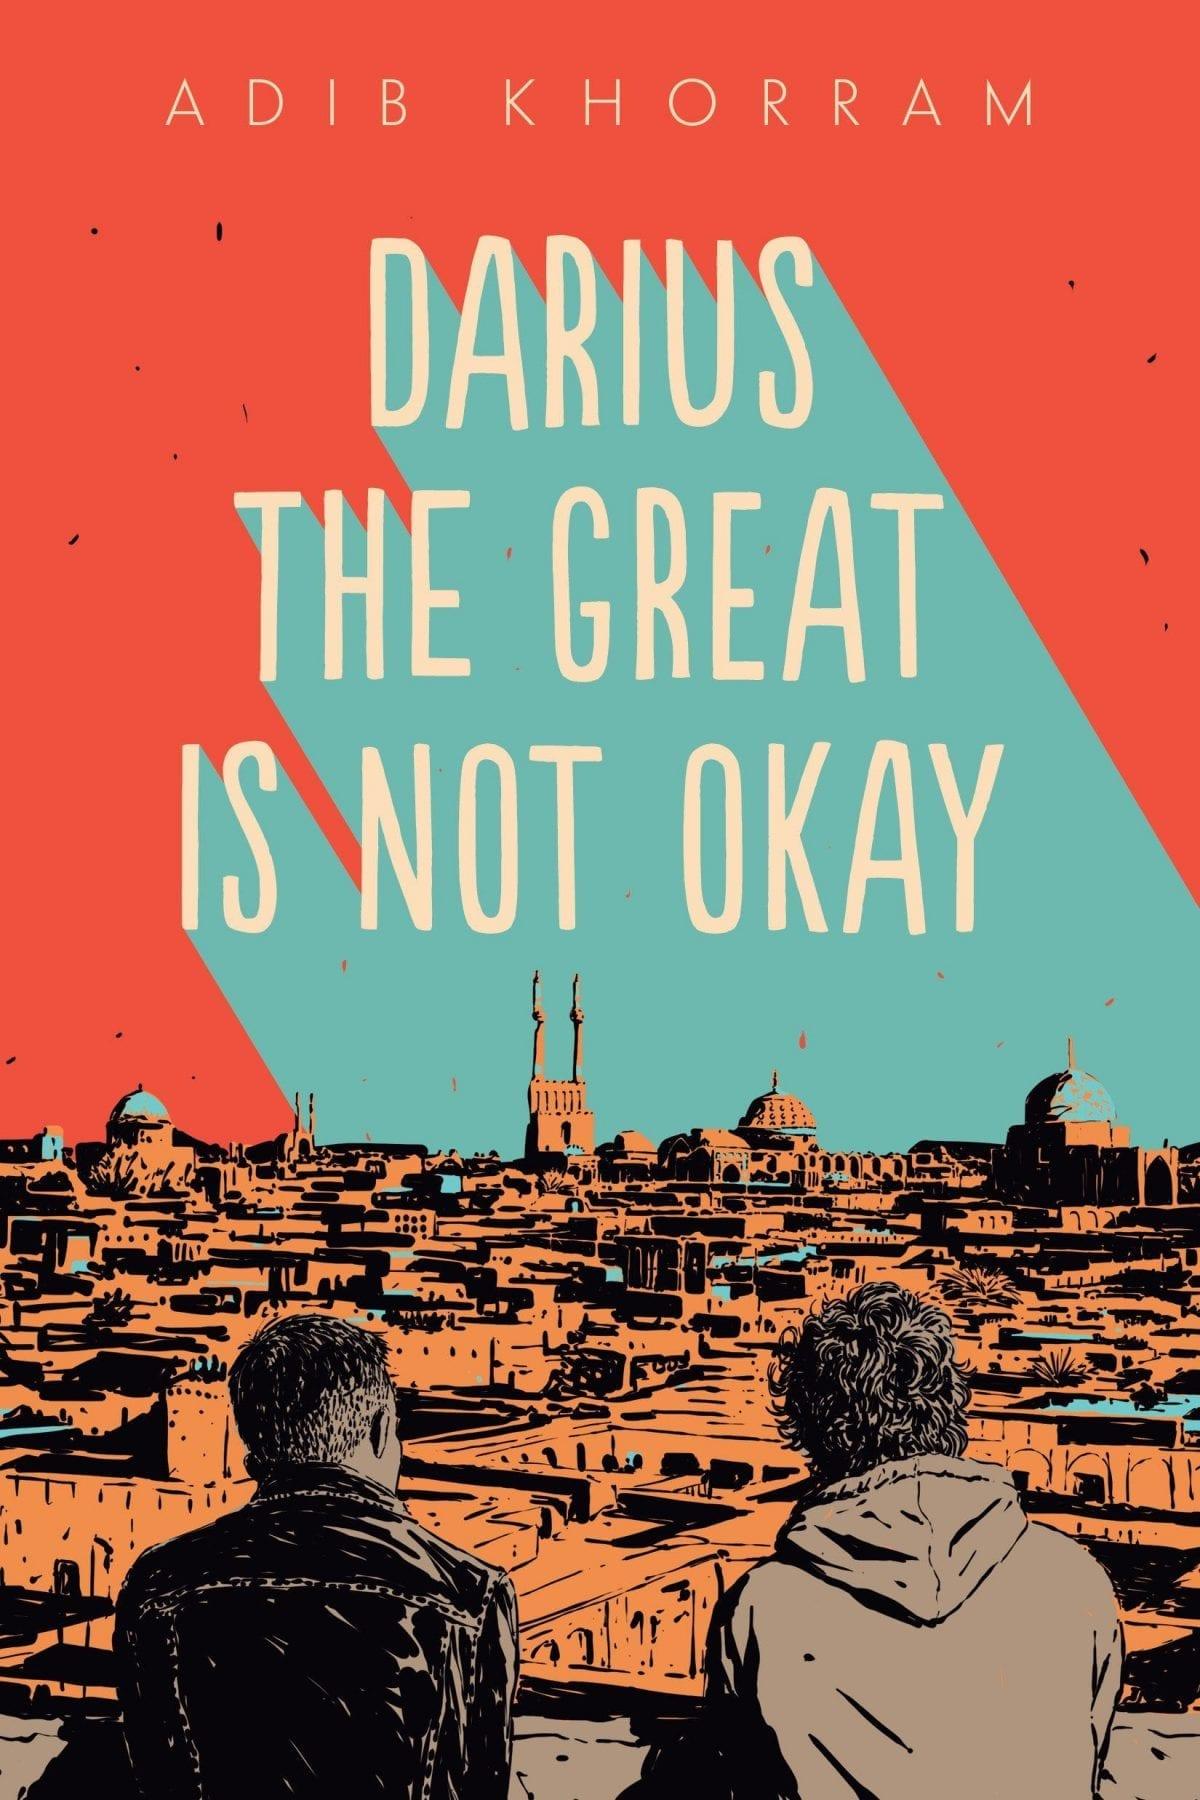 Darius the Great is Not Okay by Adib Khorram